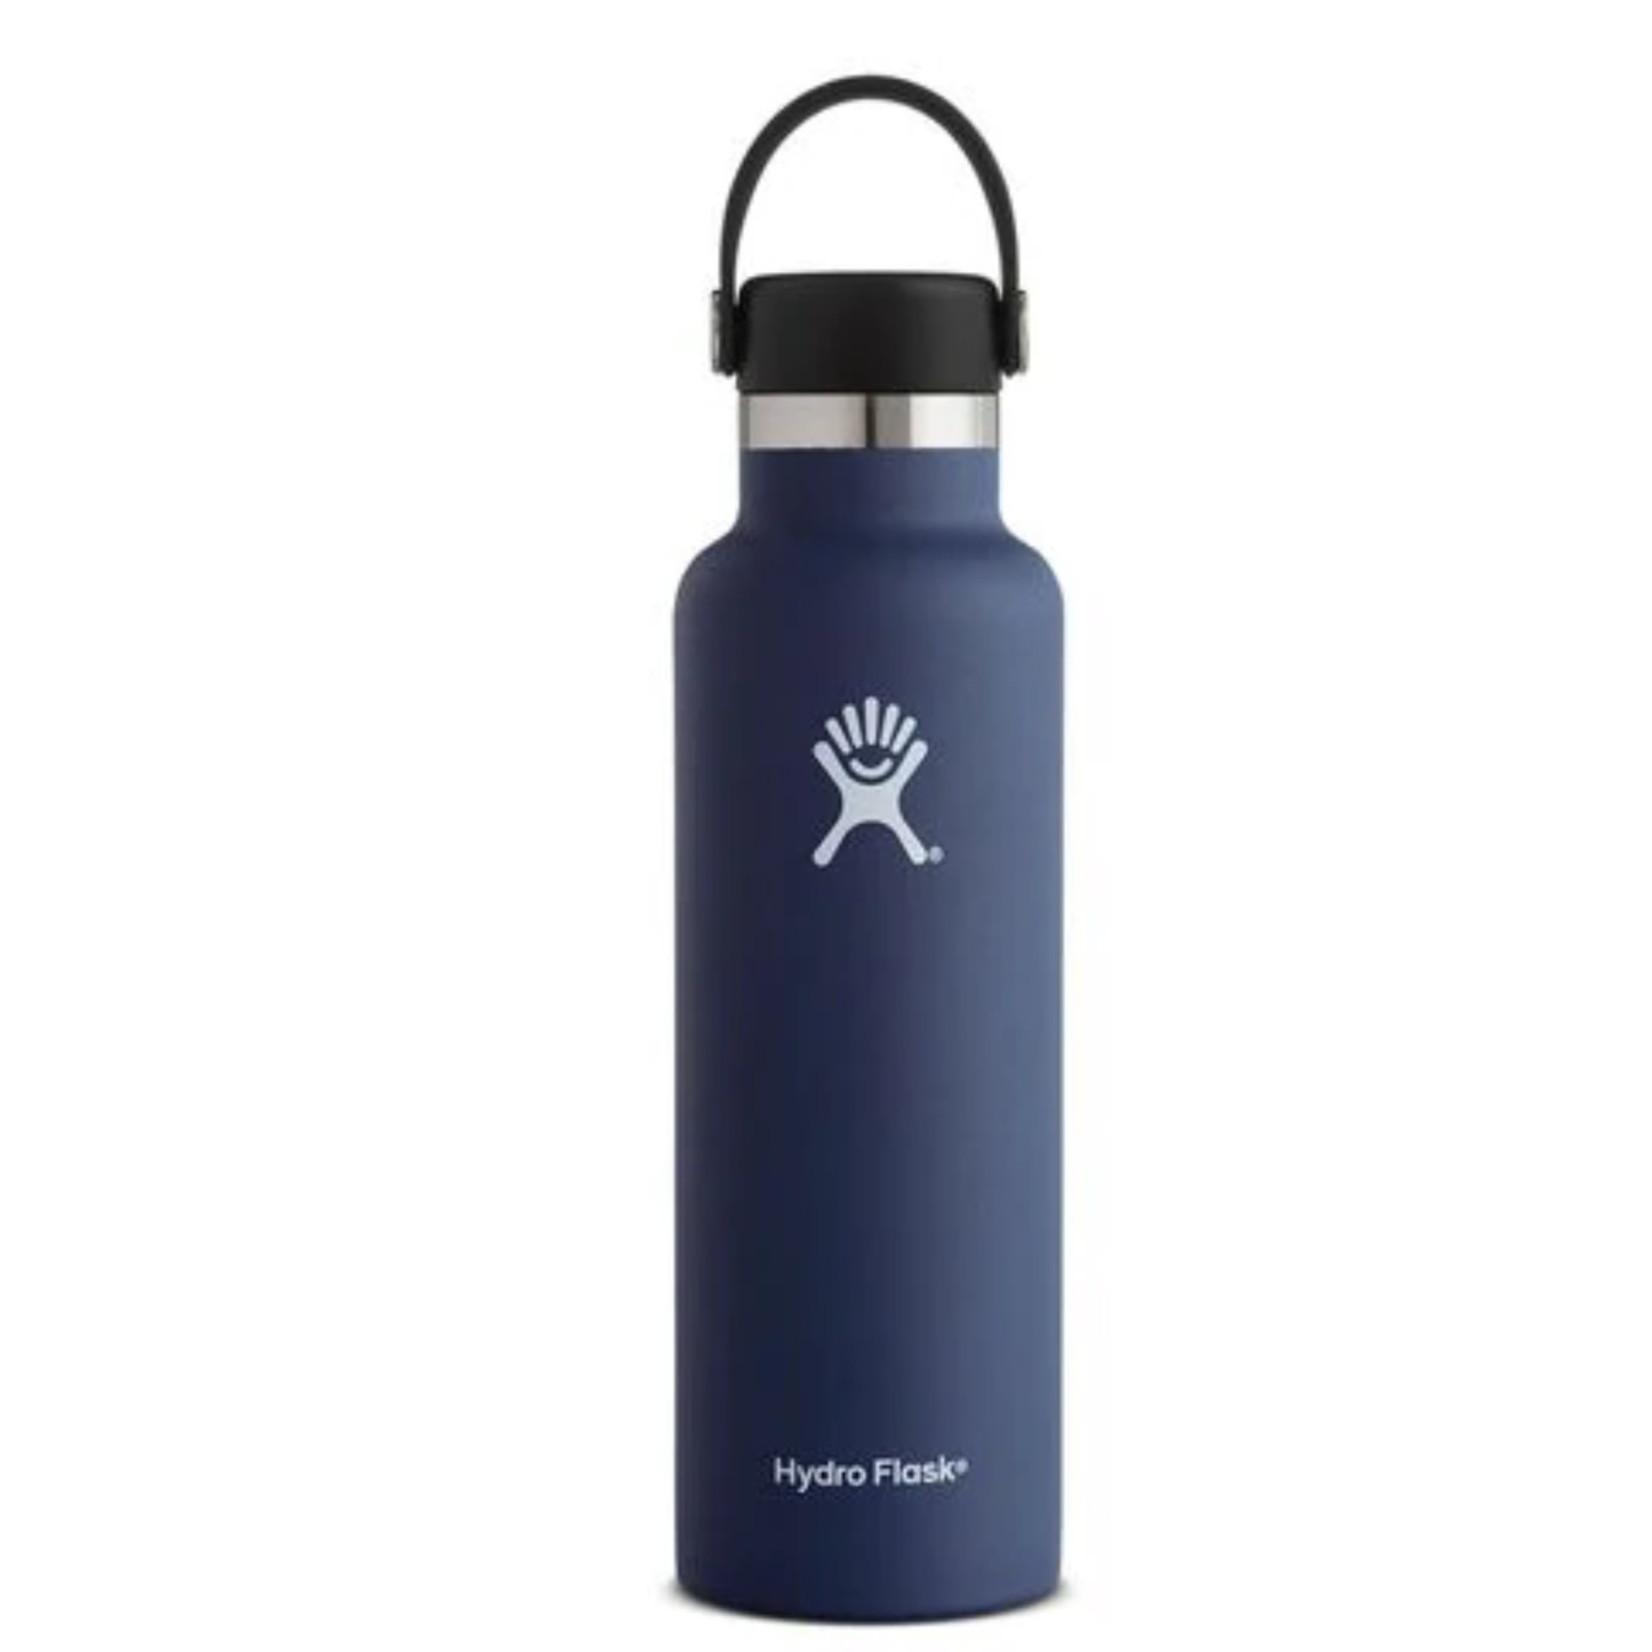 Hydro Flask Hydro Flask 18 oz. Standard Mouth w/ Flex Cap Cobalt